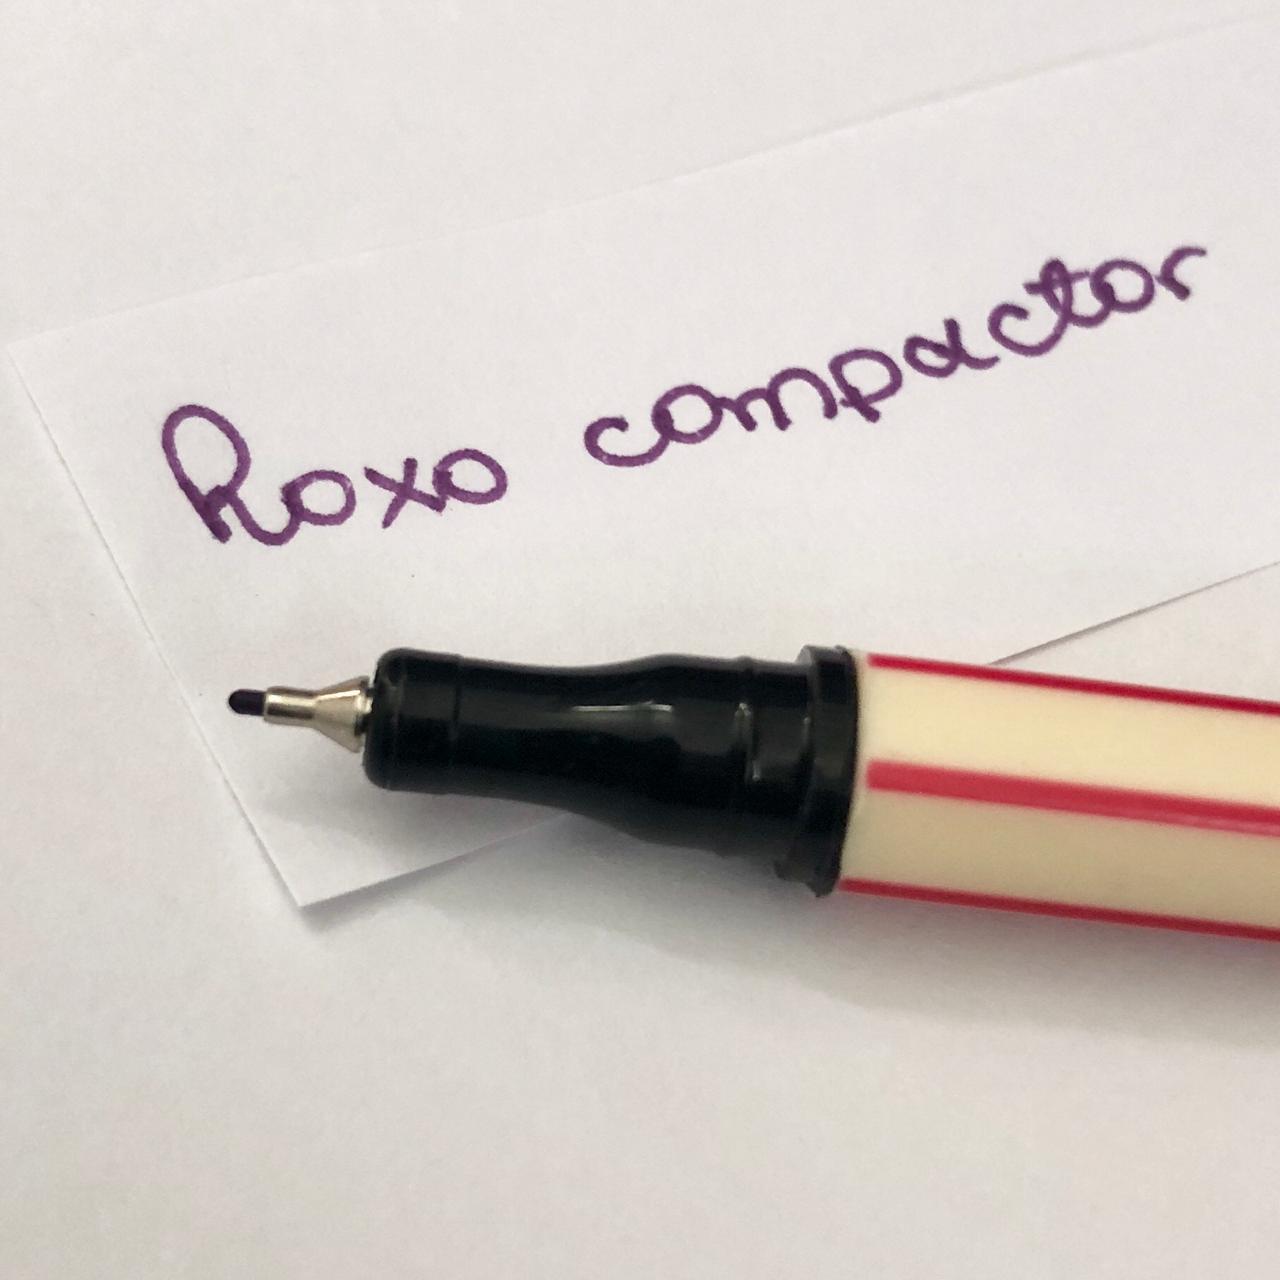 Caneta Compactor 0,4 - Roxo (COMP04)